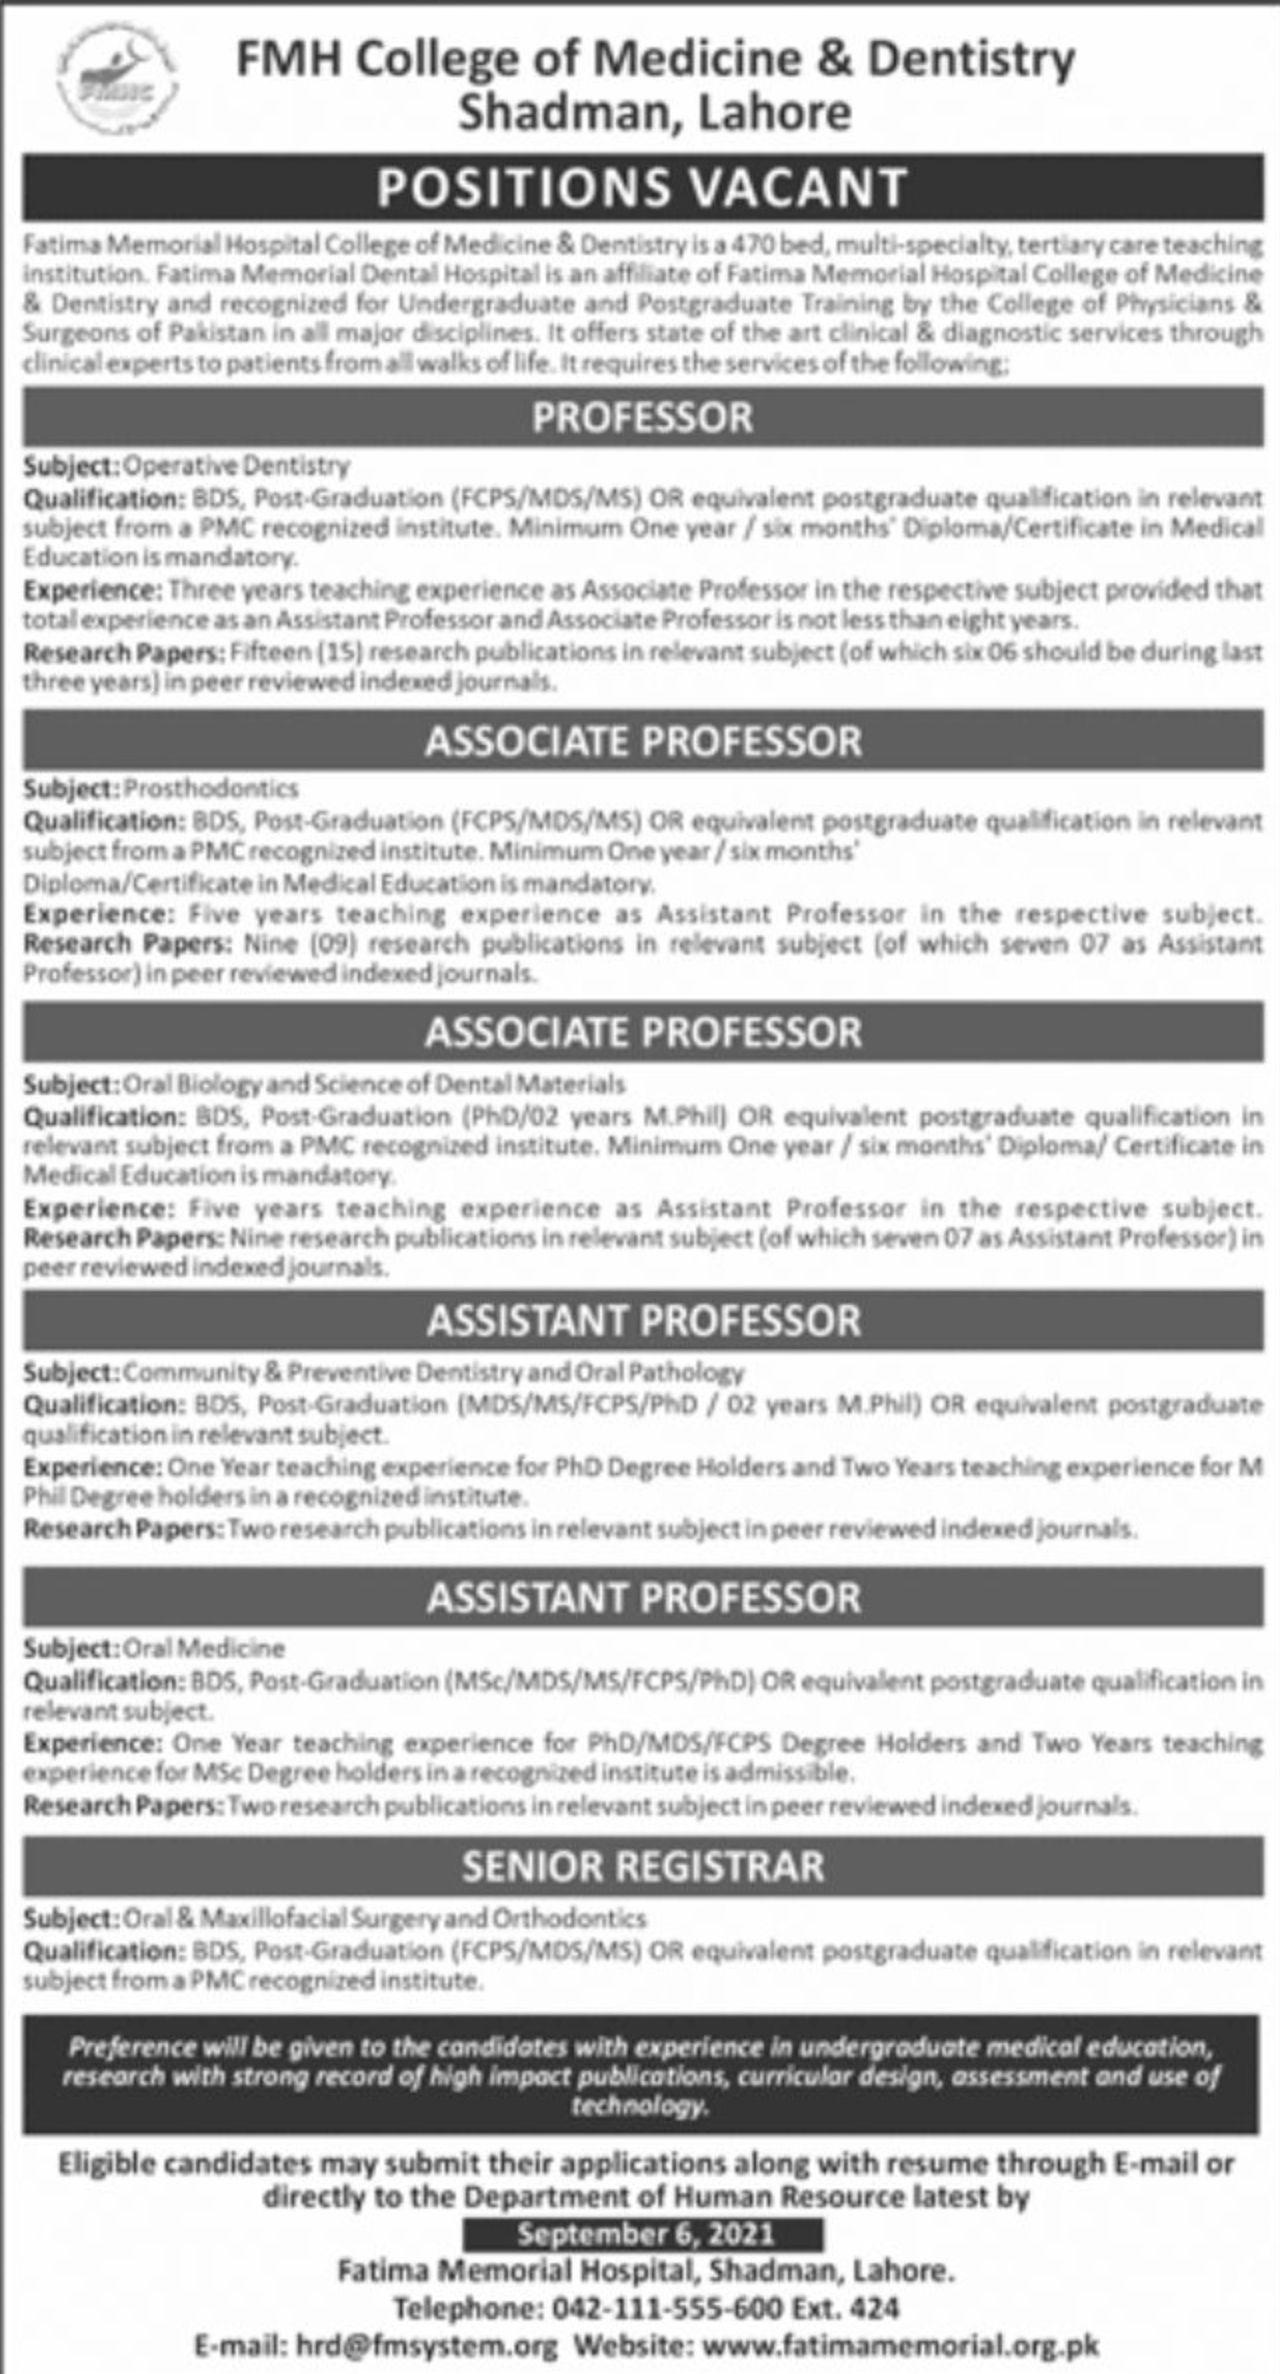 FMH College of Medicine & Dentistry Shadman Lahore Vacancies 2021 3